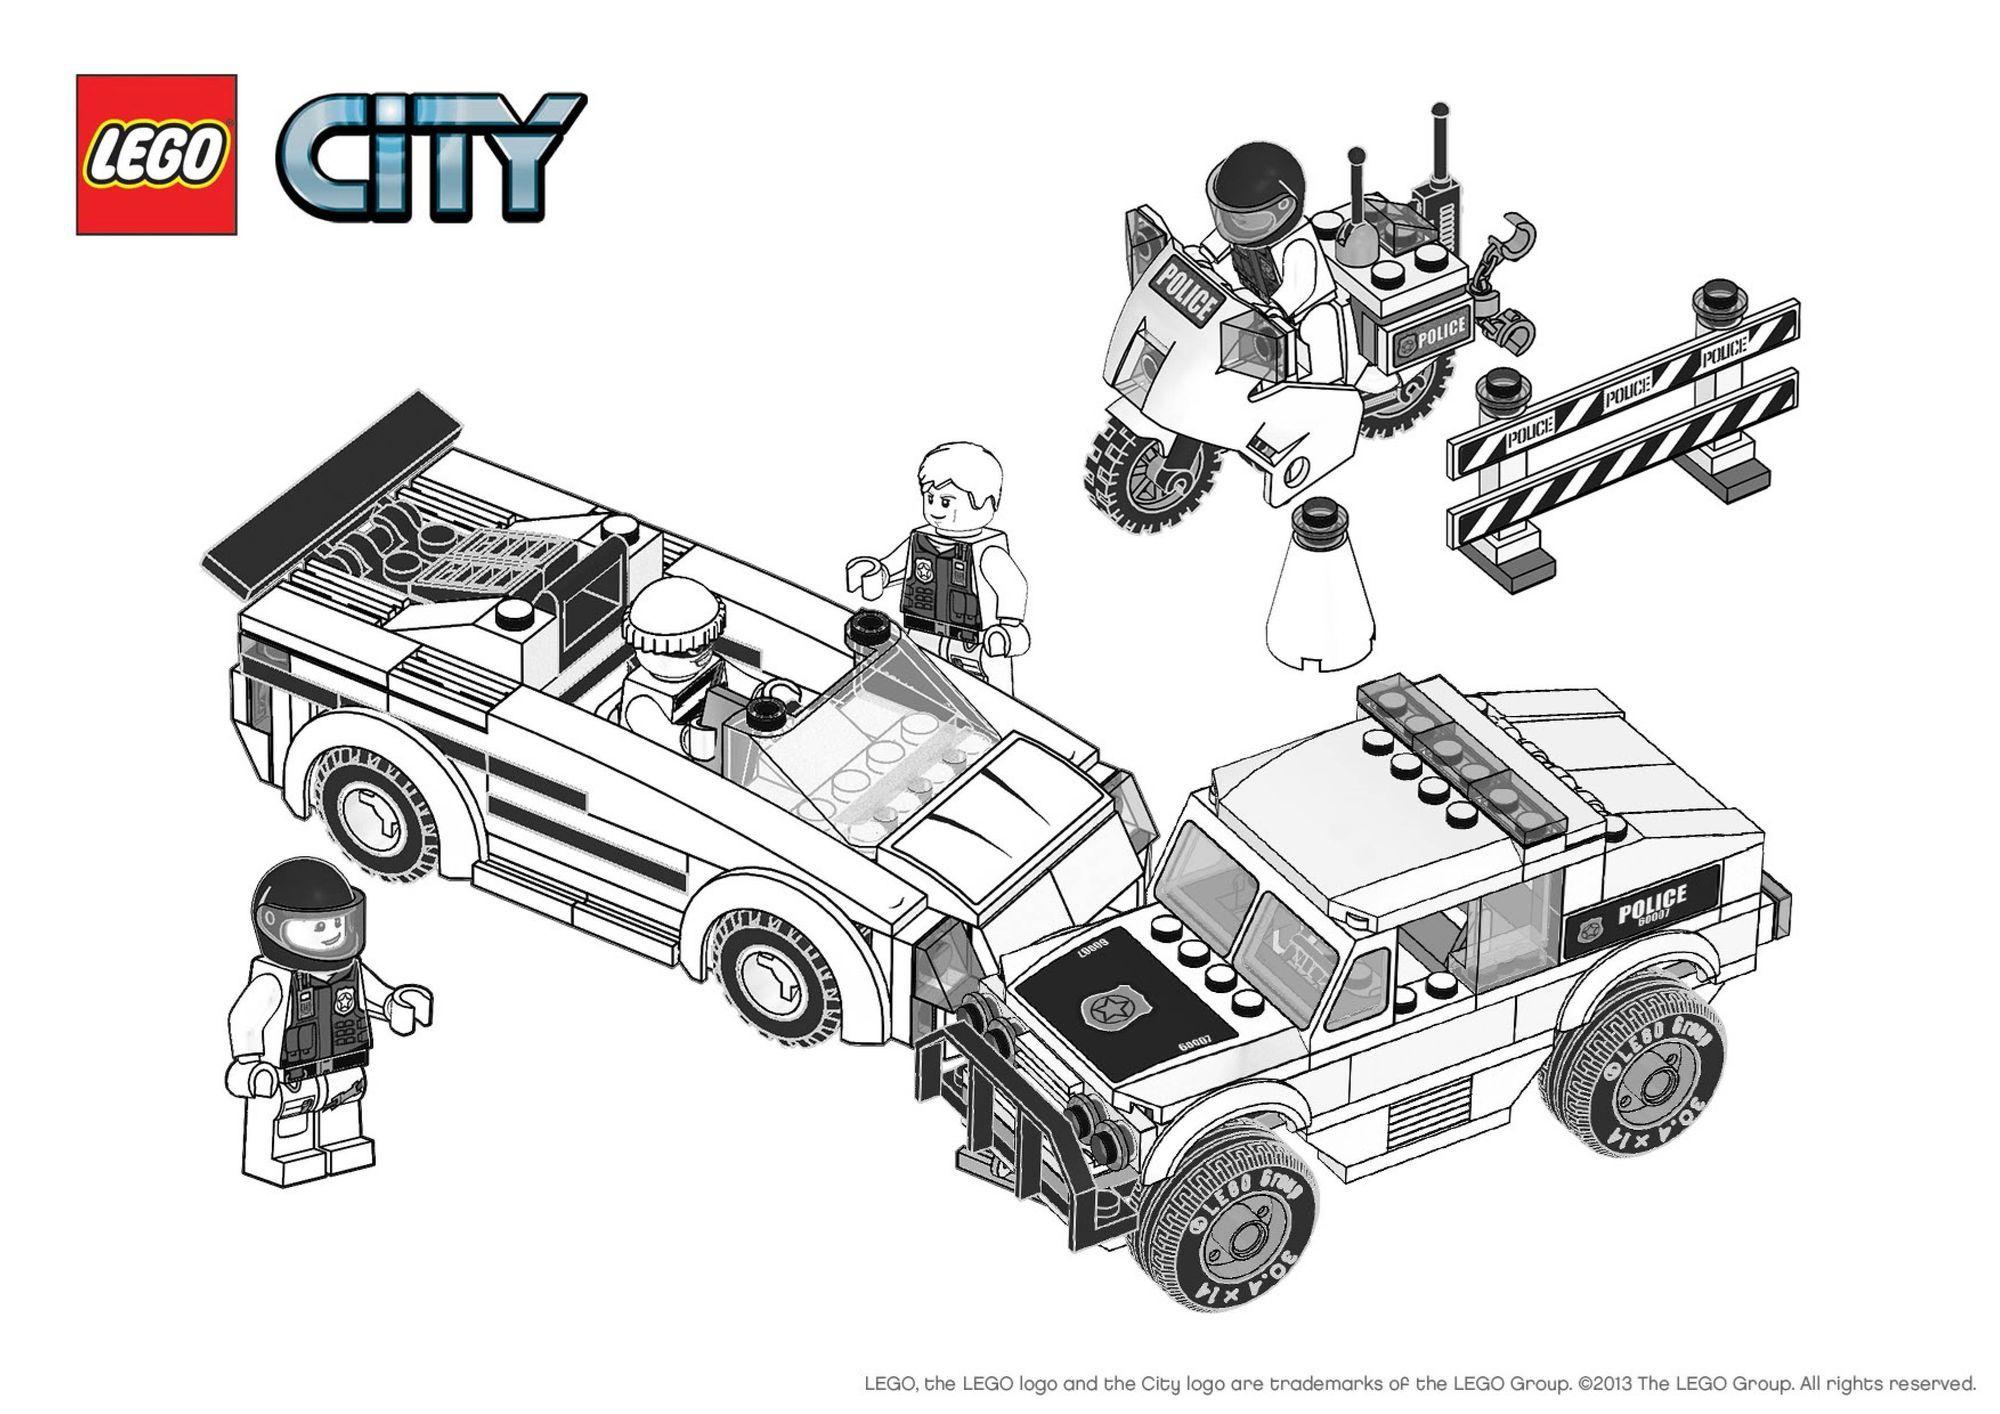 Coloriage Lego City : L'Arrestation - Coloriage Lego City encequiconcerne Dessin Animé Lego Police